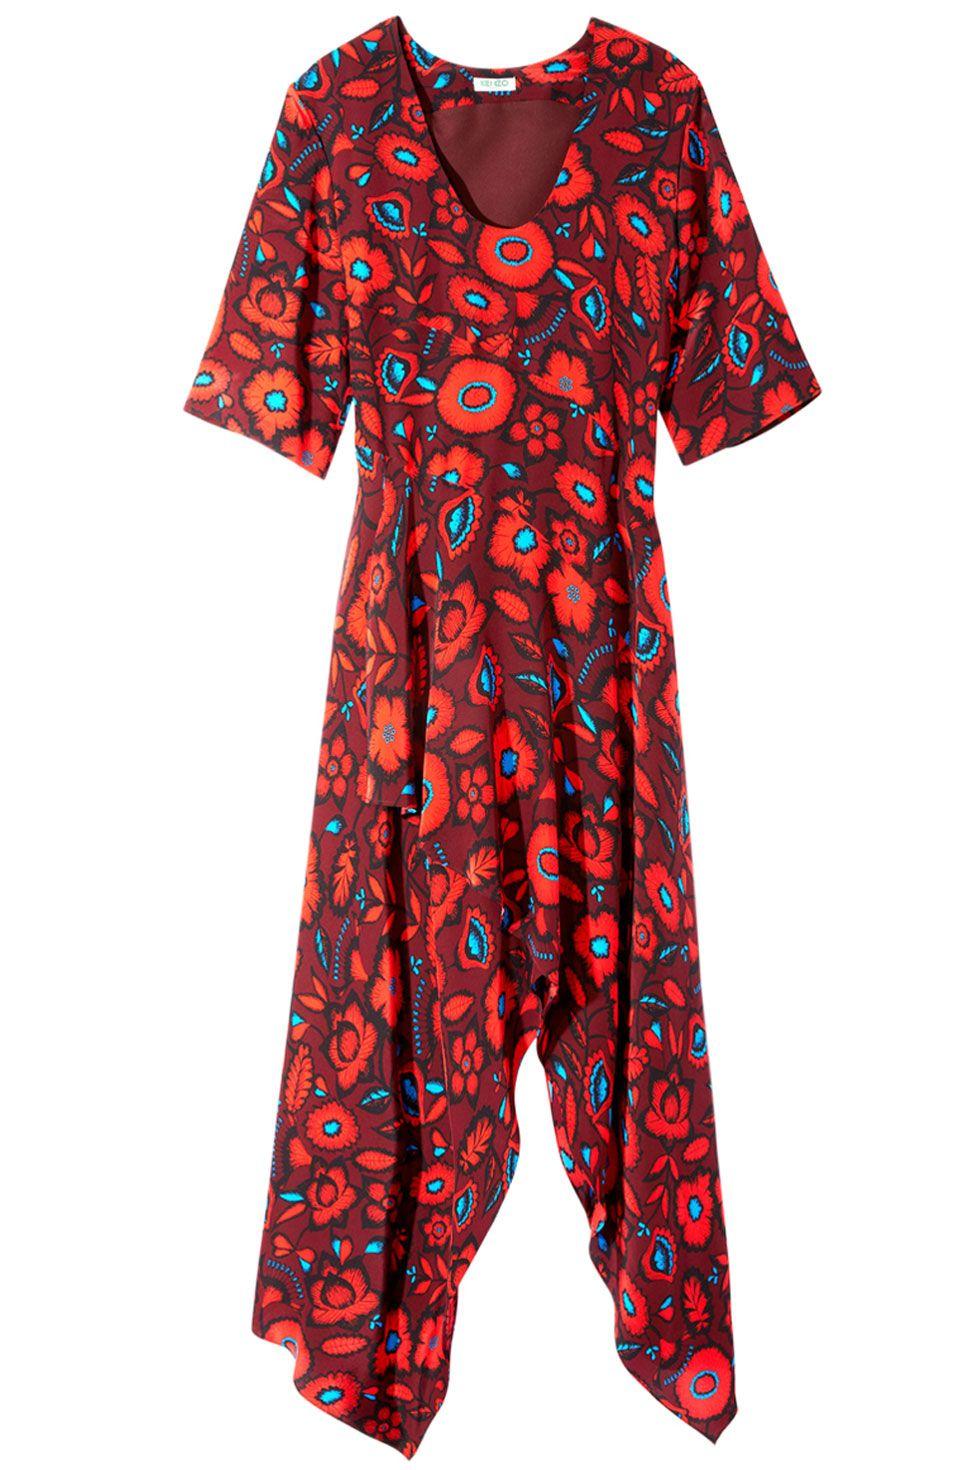 "<p>Kenzo dress, $785, <a href=""https://shop.harpersbazaar.com/Designers/K/Kenzo/Shadow-Flowers-Print-Silk-Jaquard-SS-Hankerchief-Maxidress-5136.html"" target=""_blank"">shopBAZAAR.com</a></p>"